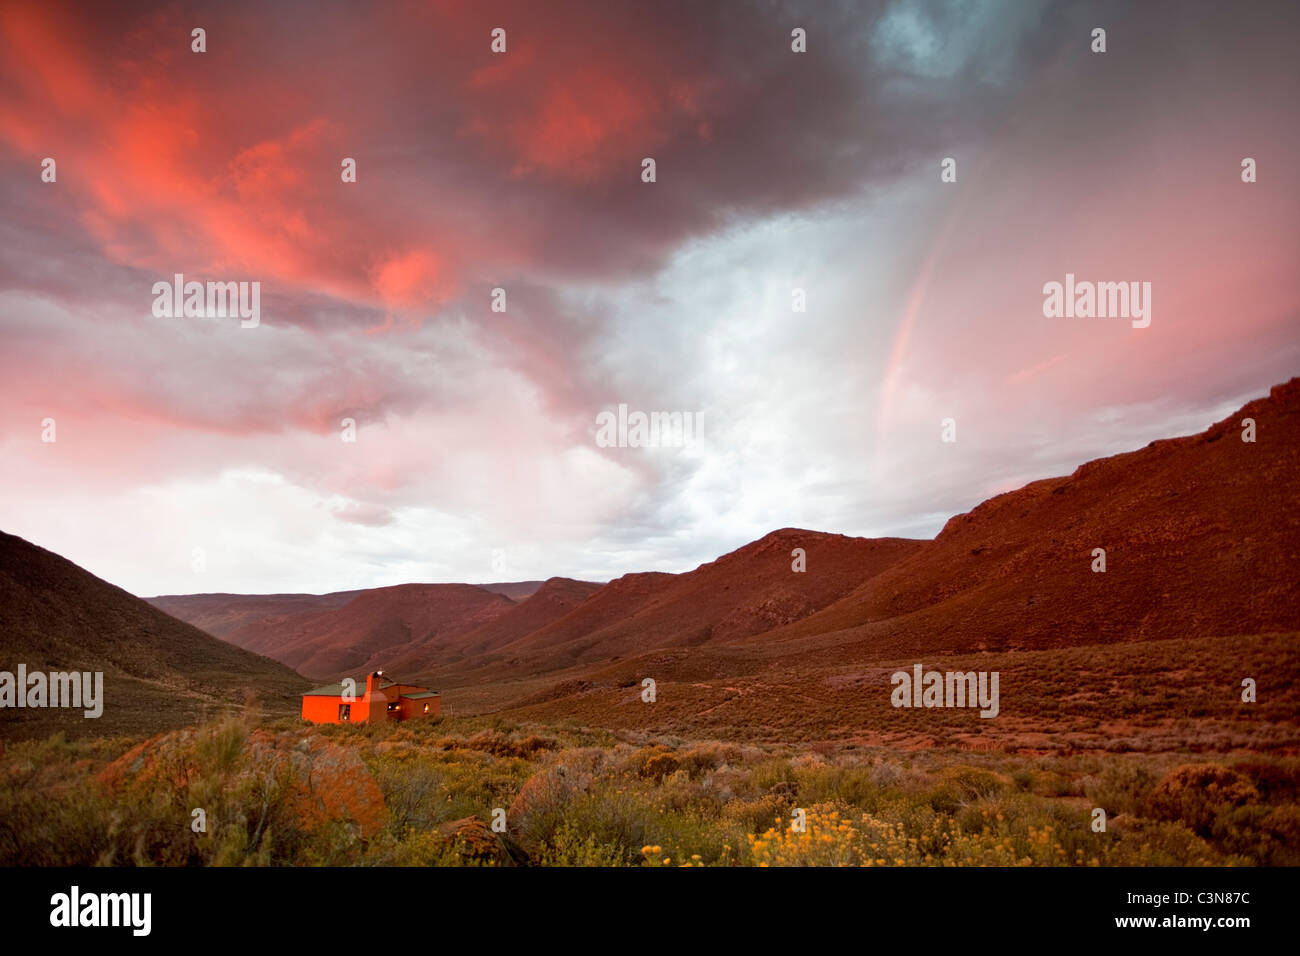 South Africa, Western Cape, Montagu, Simonskloof Mountain Retreat. - Stock Image